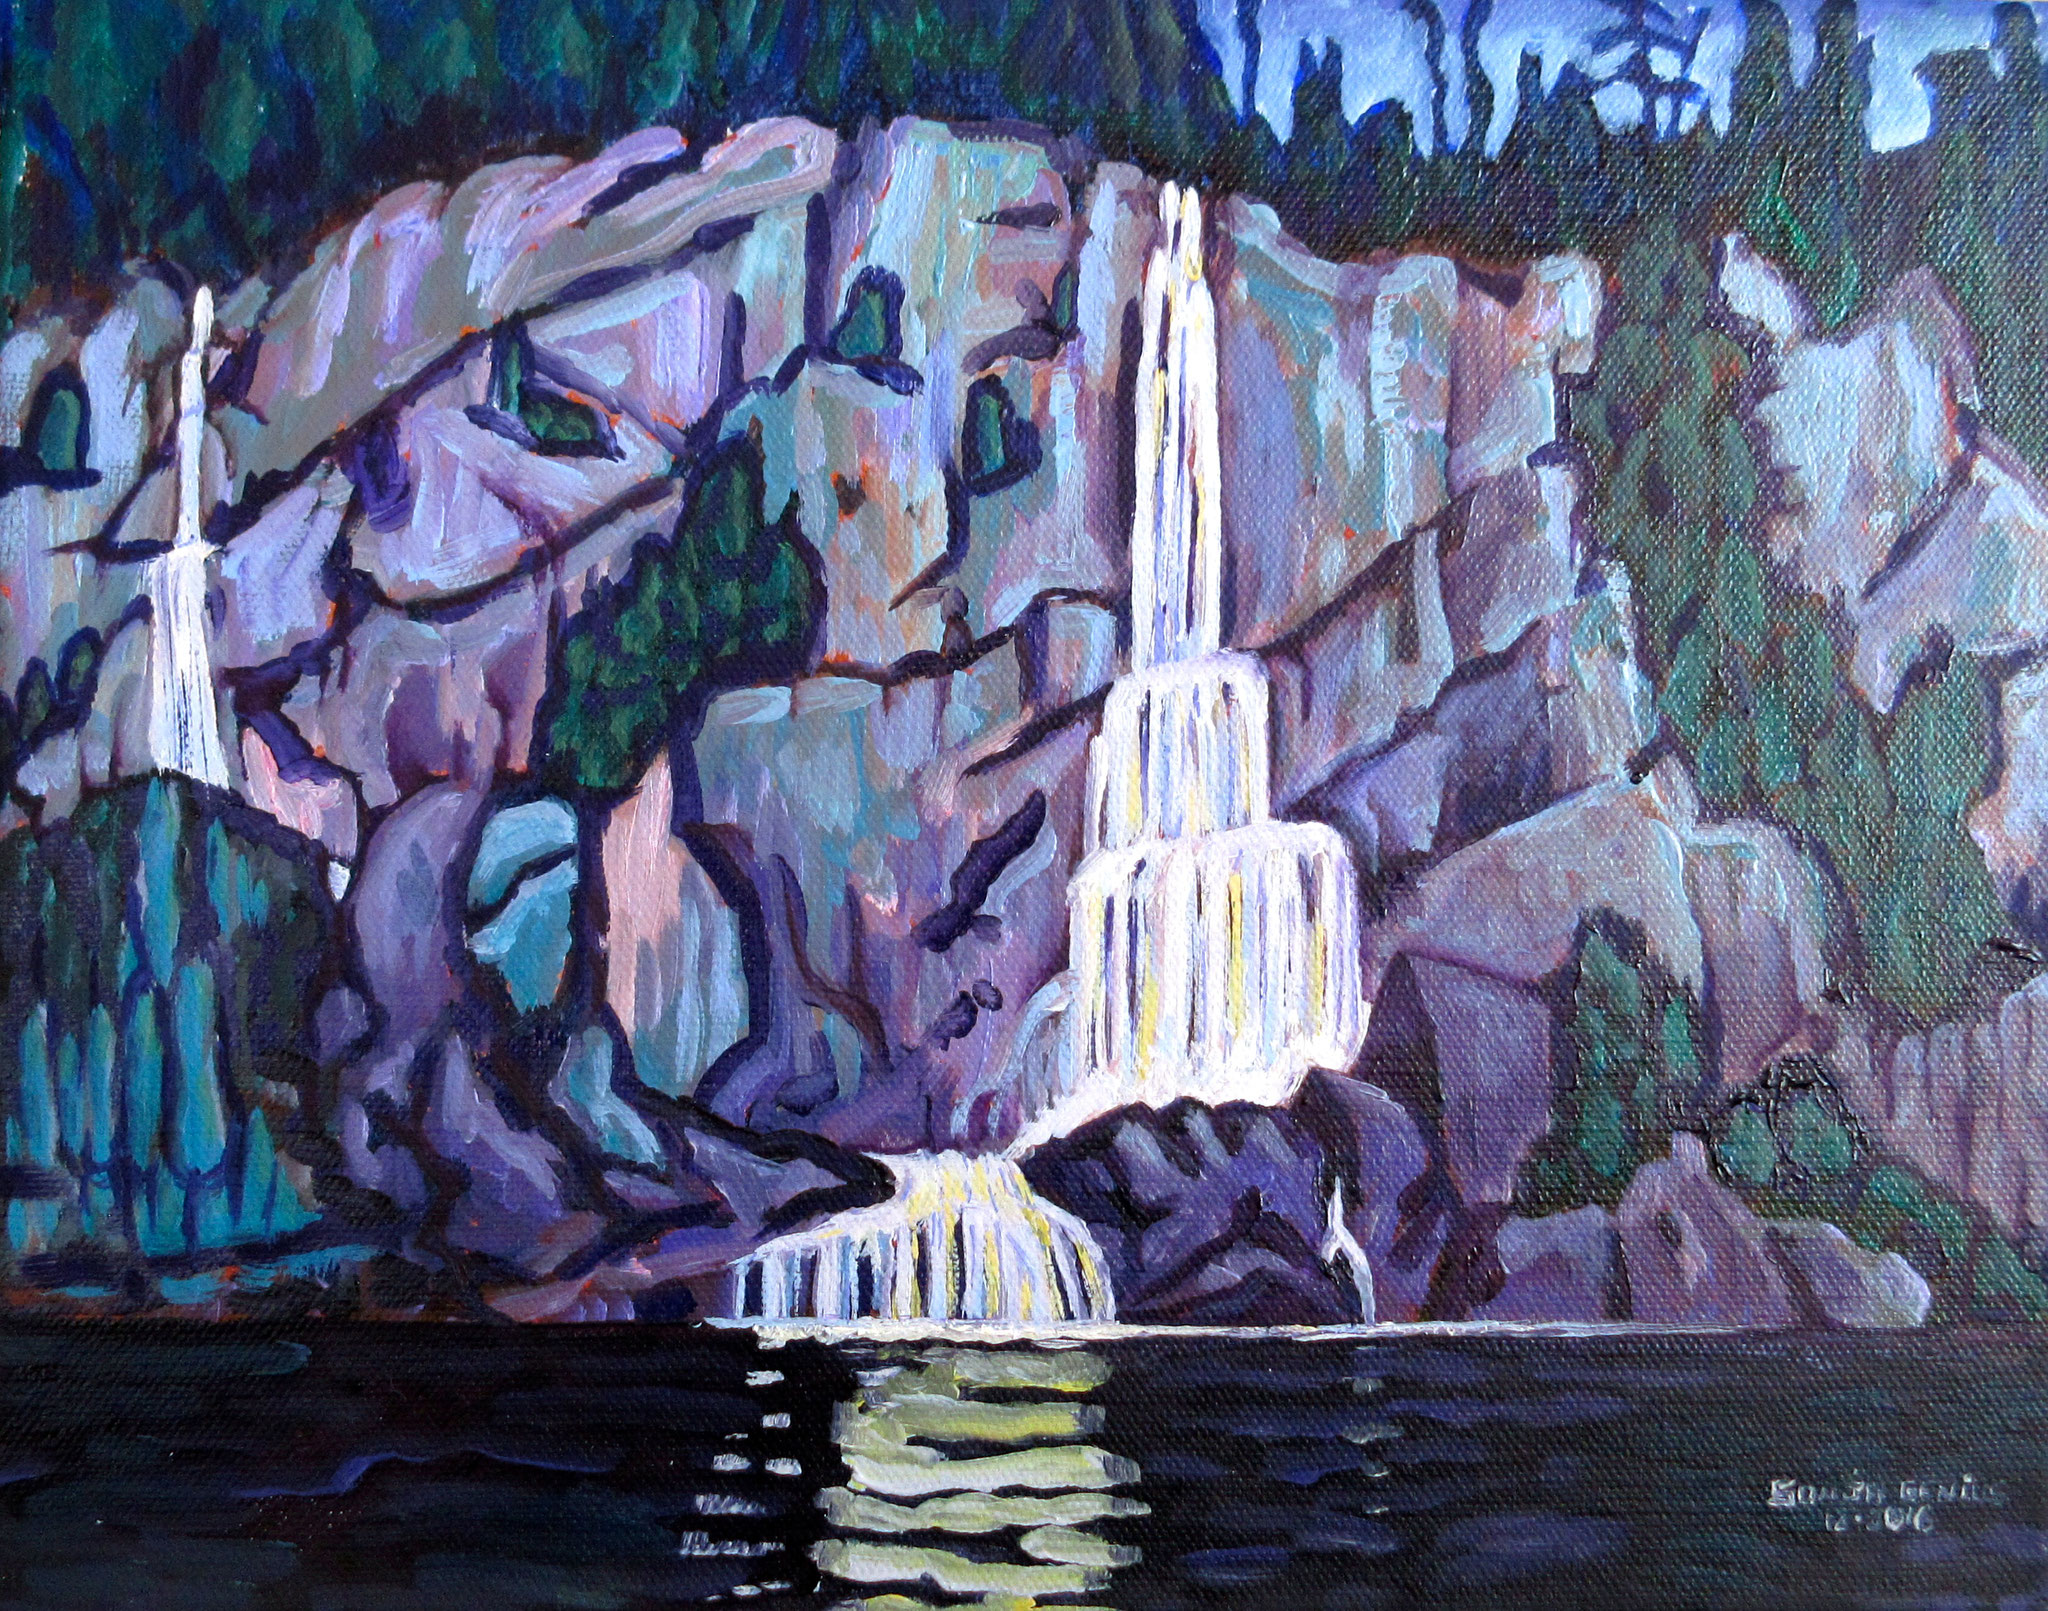 after Lawren Harris's 'Waterfall', oil on canvas 11x14, Dec.2016 - (1)